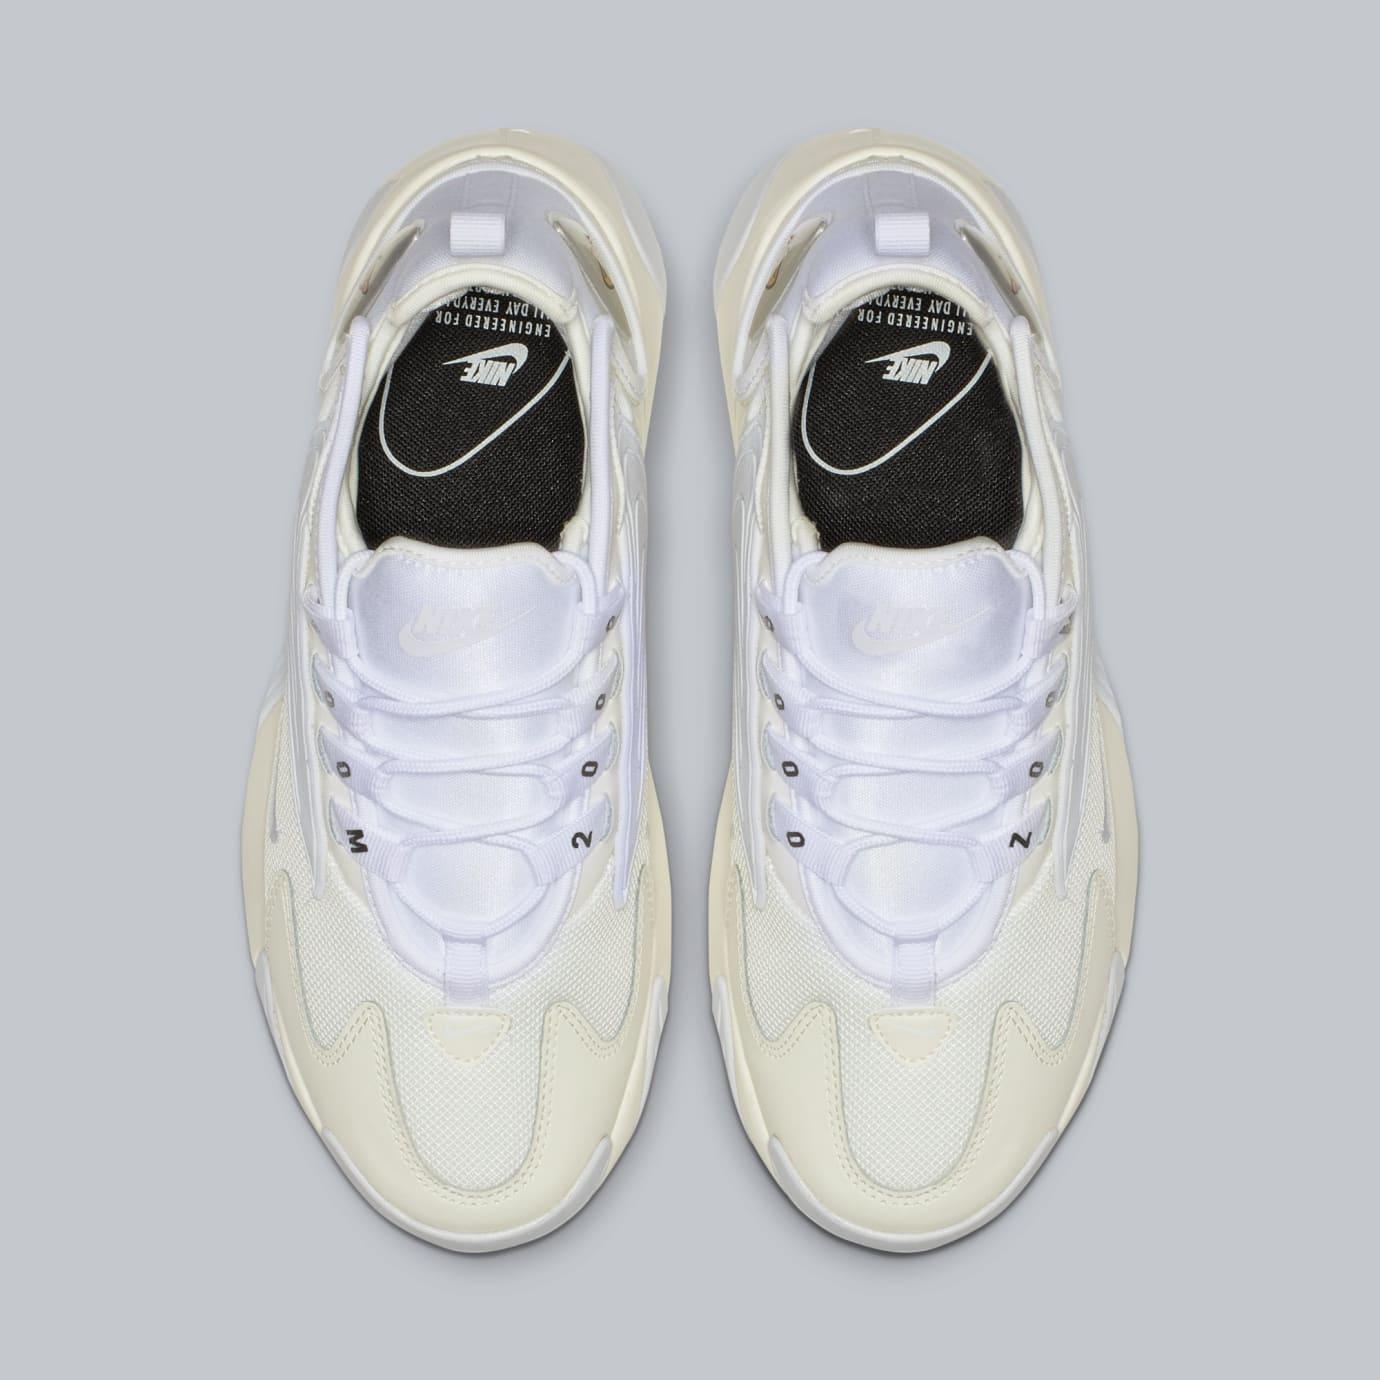 0dc9a35c963d WMNS Nike Zoom 2K AO0354-100 AO0354-101 AO0354-500 Release Date ...